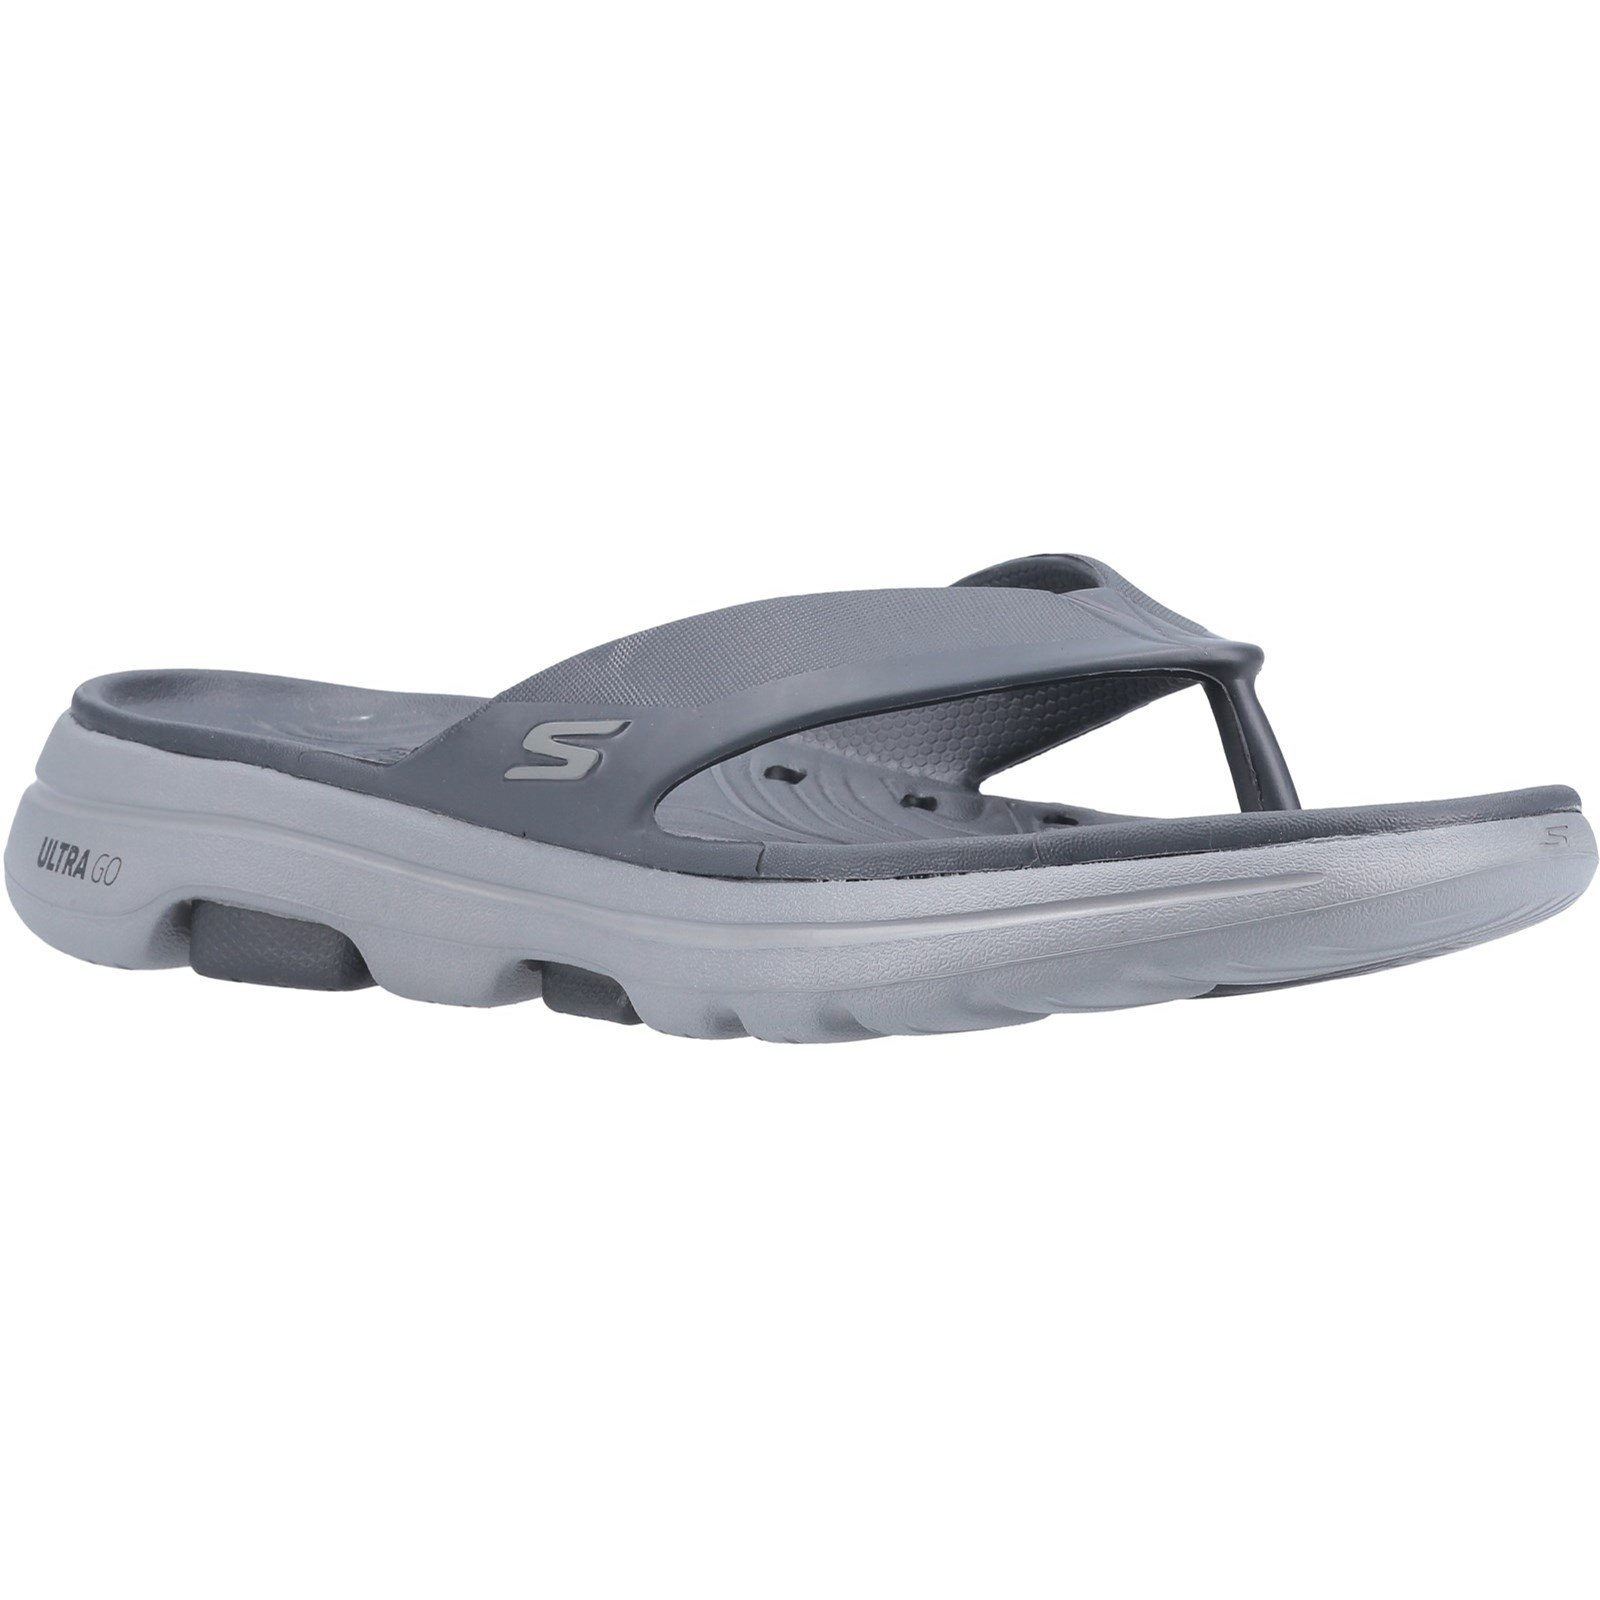 Skechers Men's GOwalk 5 Cabana Toe Post Sandal Charcoal 32207 - Charcoal 7